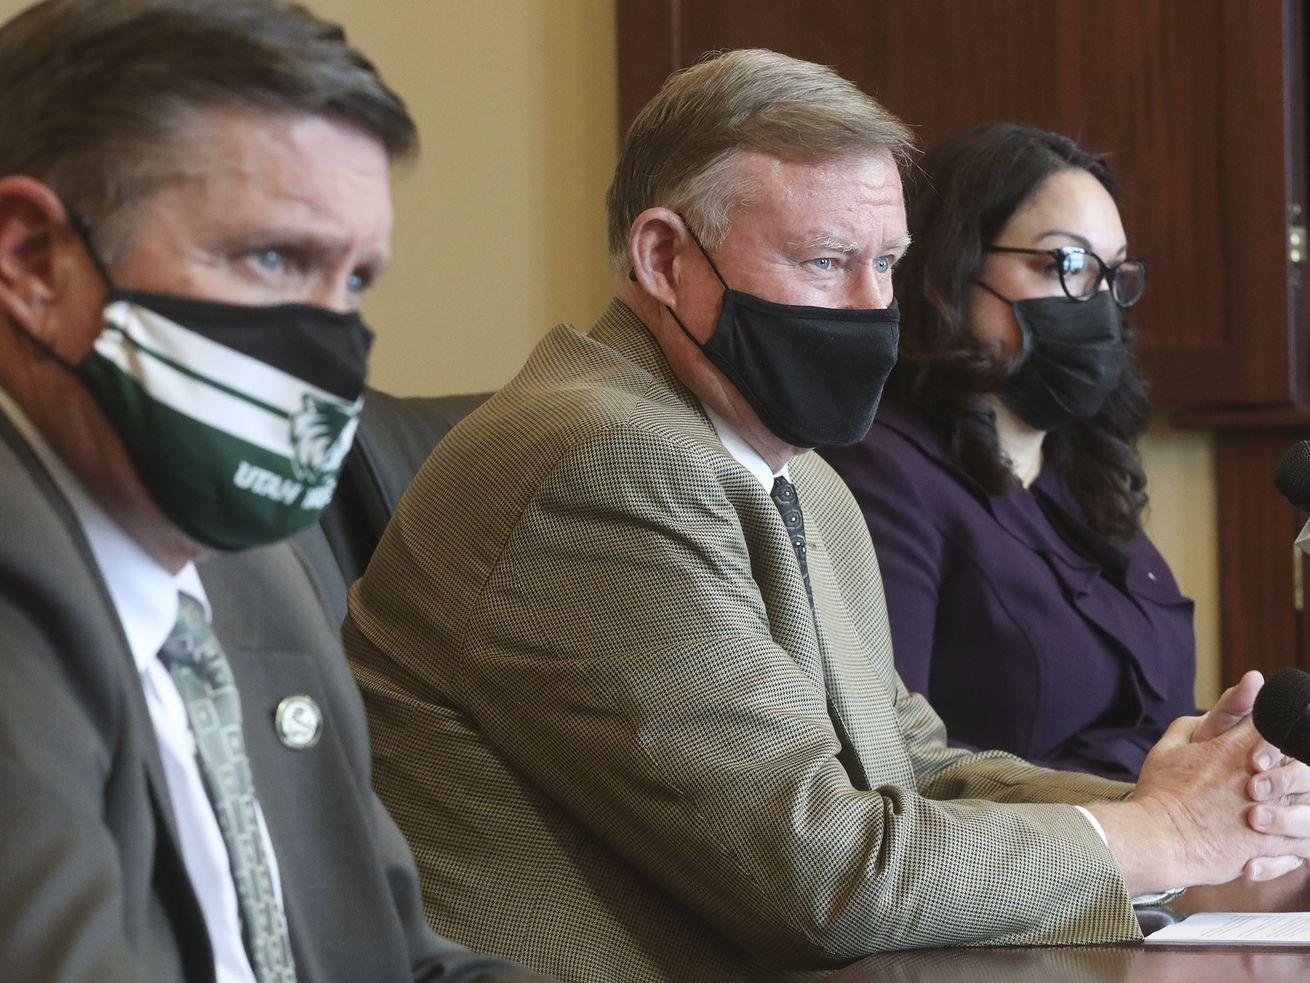 Rep. Val Peterson, R-Orem, left, Senate Majority Leader Evan Vickers, R-Cedar City, and Sen. Luz Escamilla, D-Salt Lake City, discuss SB195 in the Senate Rules Room at the Capitol in Salt Lake City on Wednesday, Feb. 17, 2021.